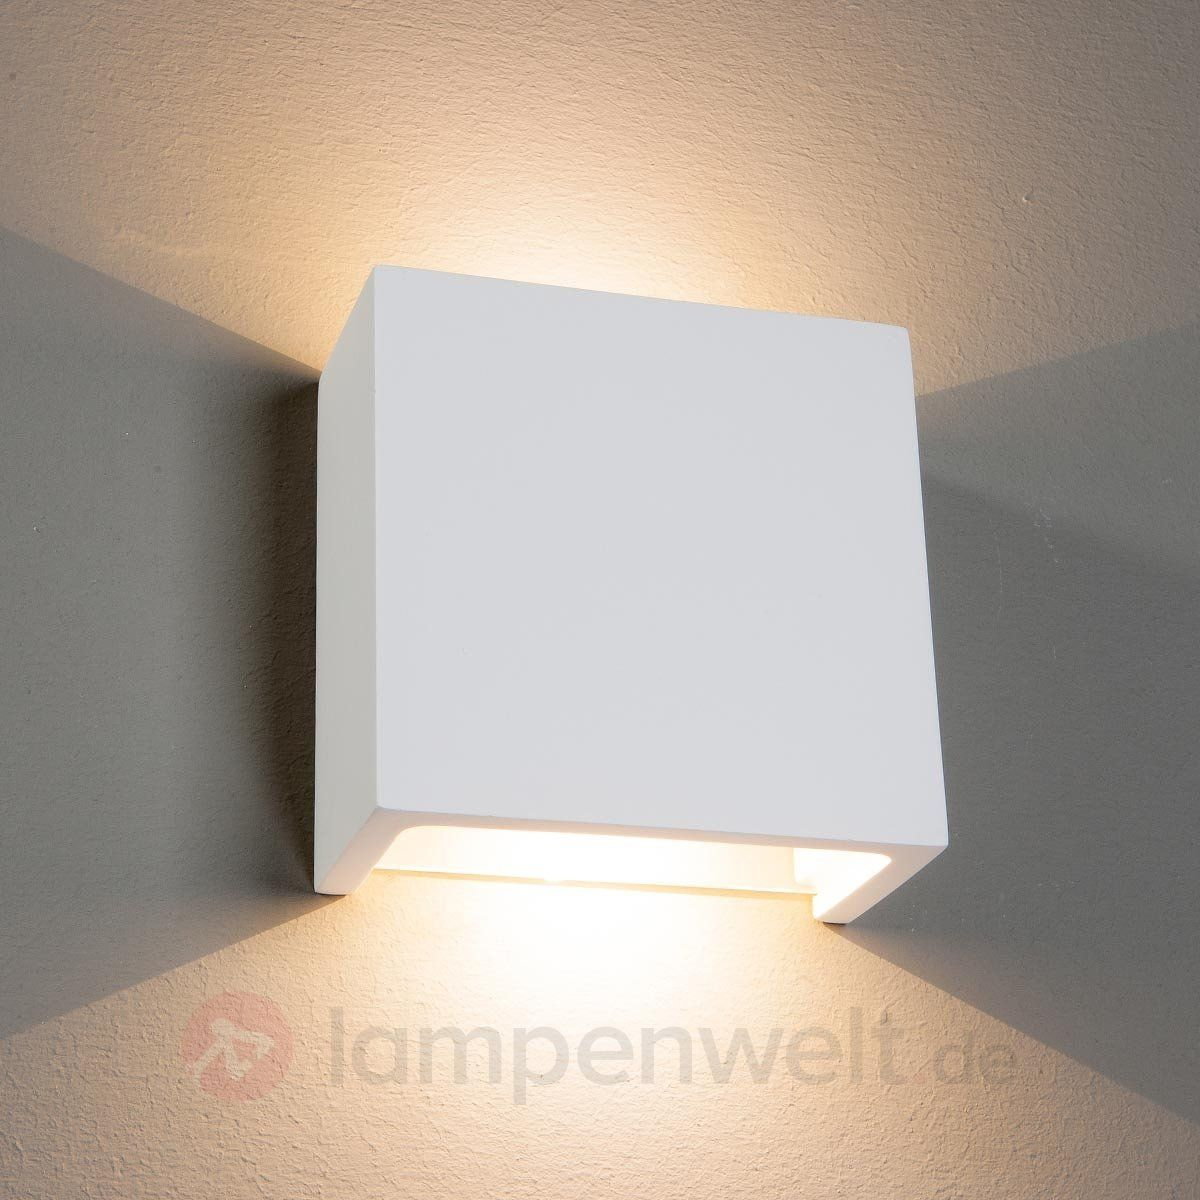 Led wandleuchte fabiola aus gips kaufen lampen for Lampen quadratisch